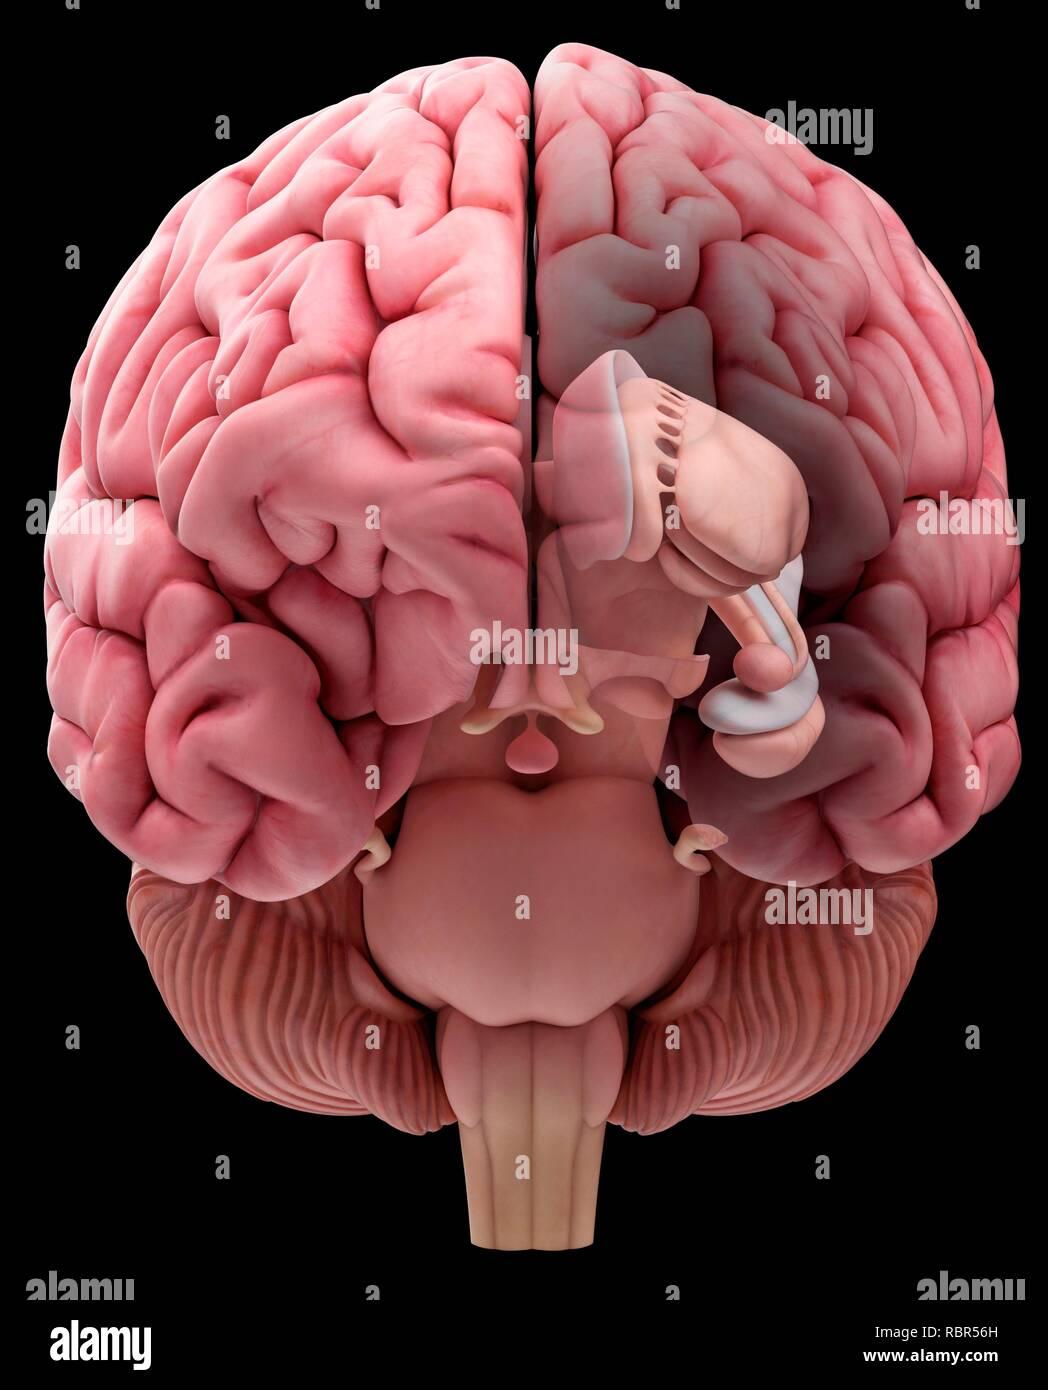 Illustration of the anterior human brain. - Stock Image